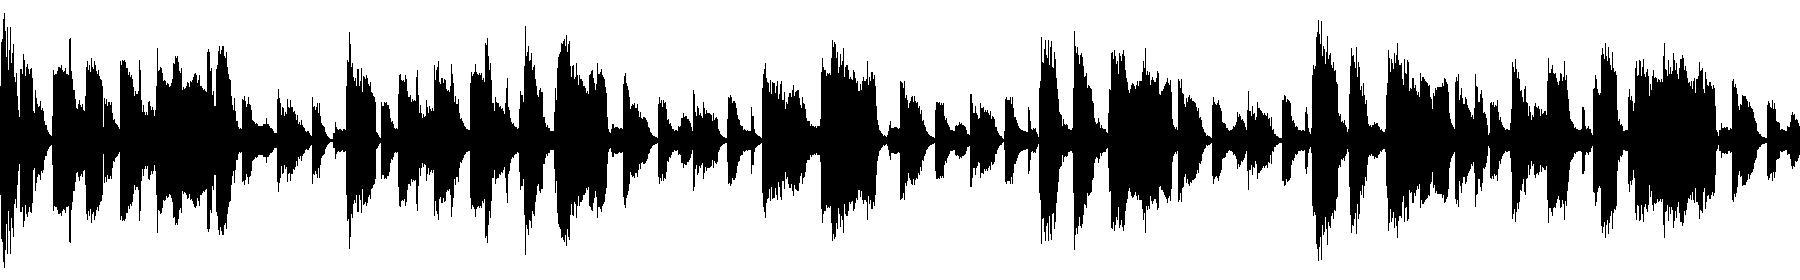 3 am 126 demo sax loop raul romo